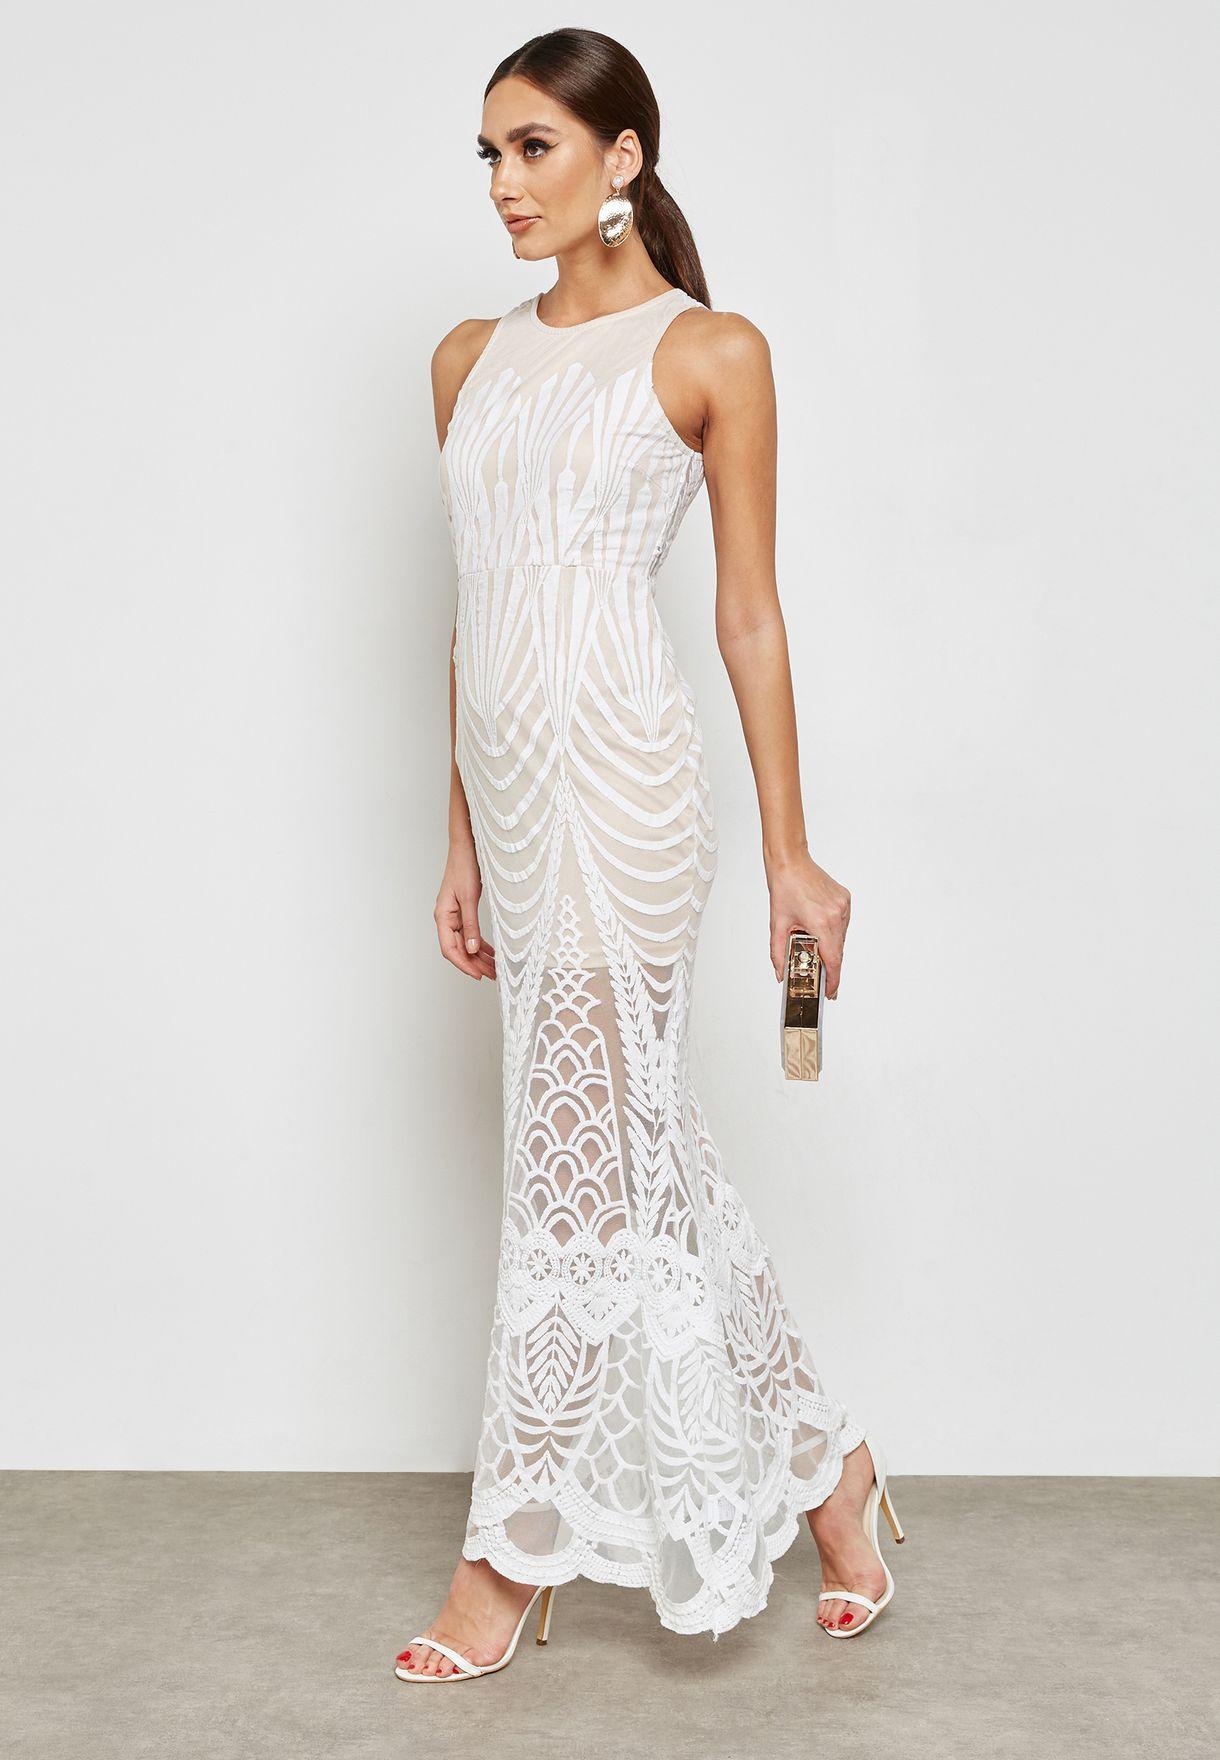 Lace Mesh Overlay Dress